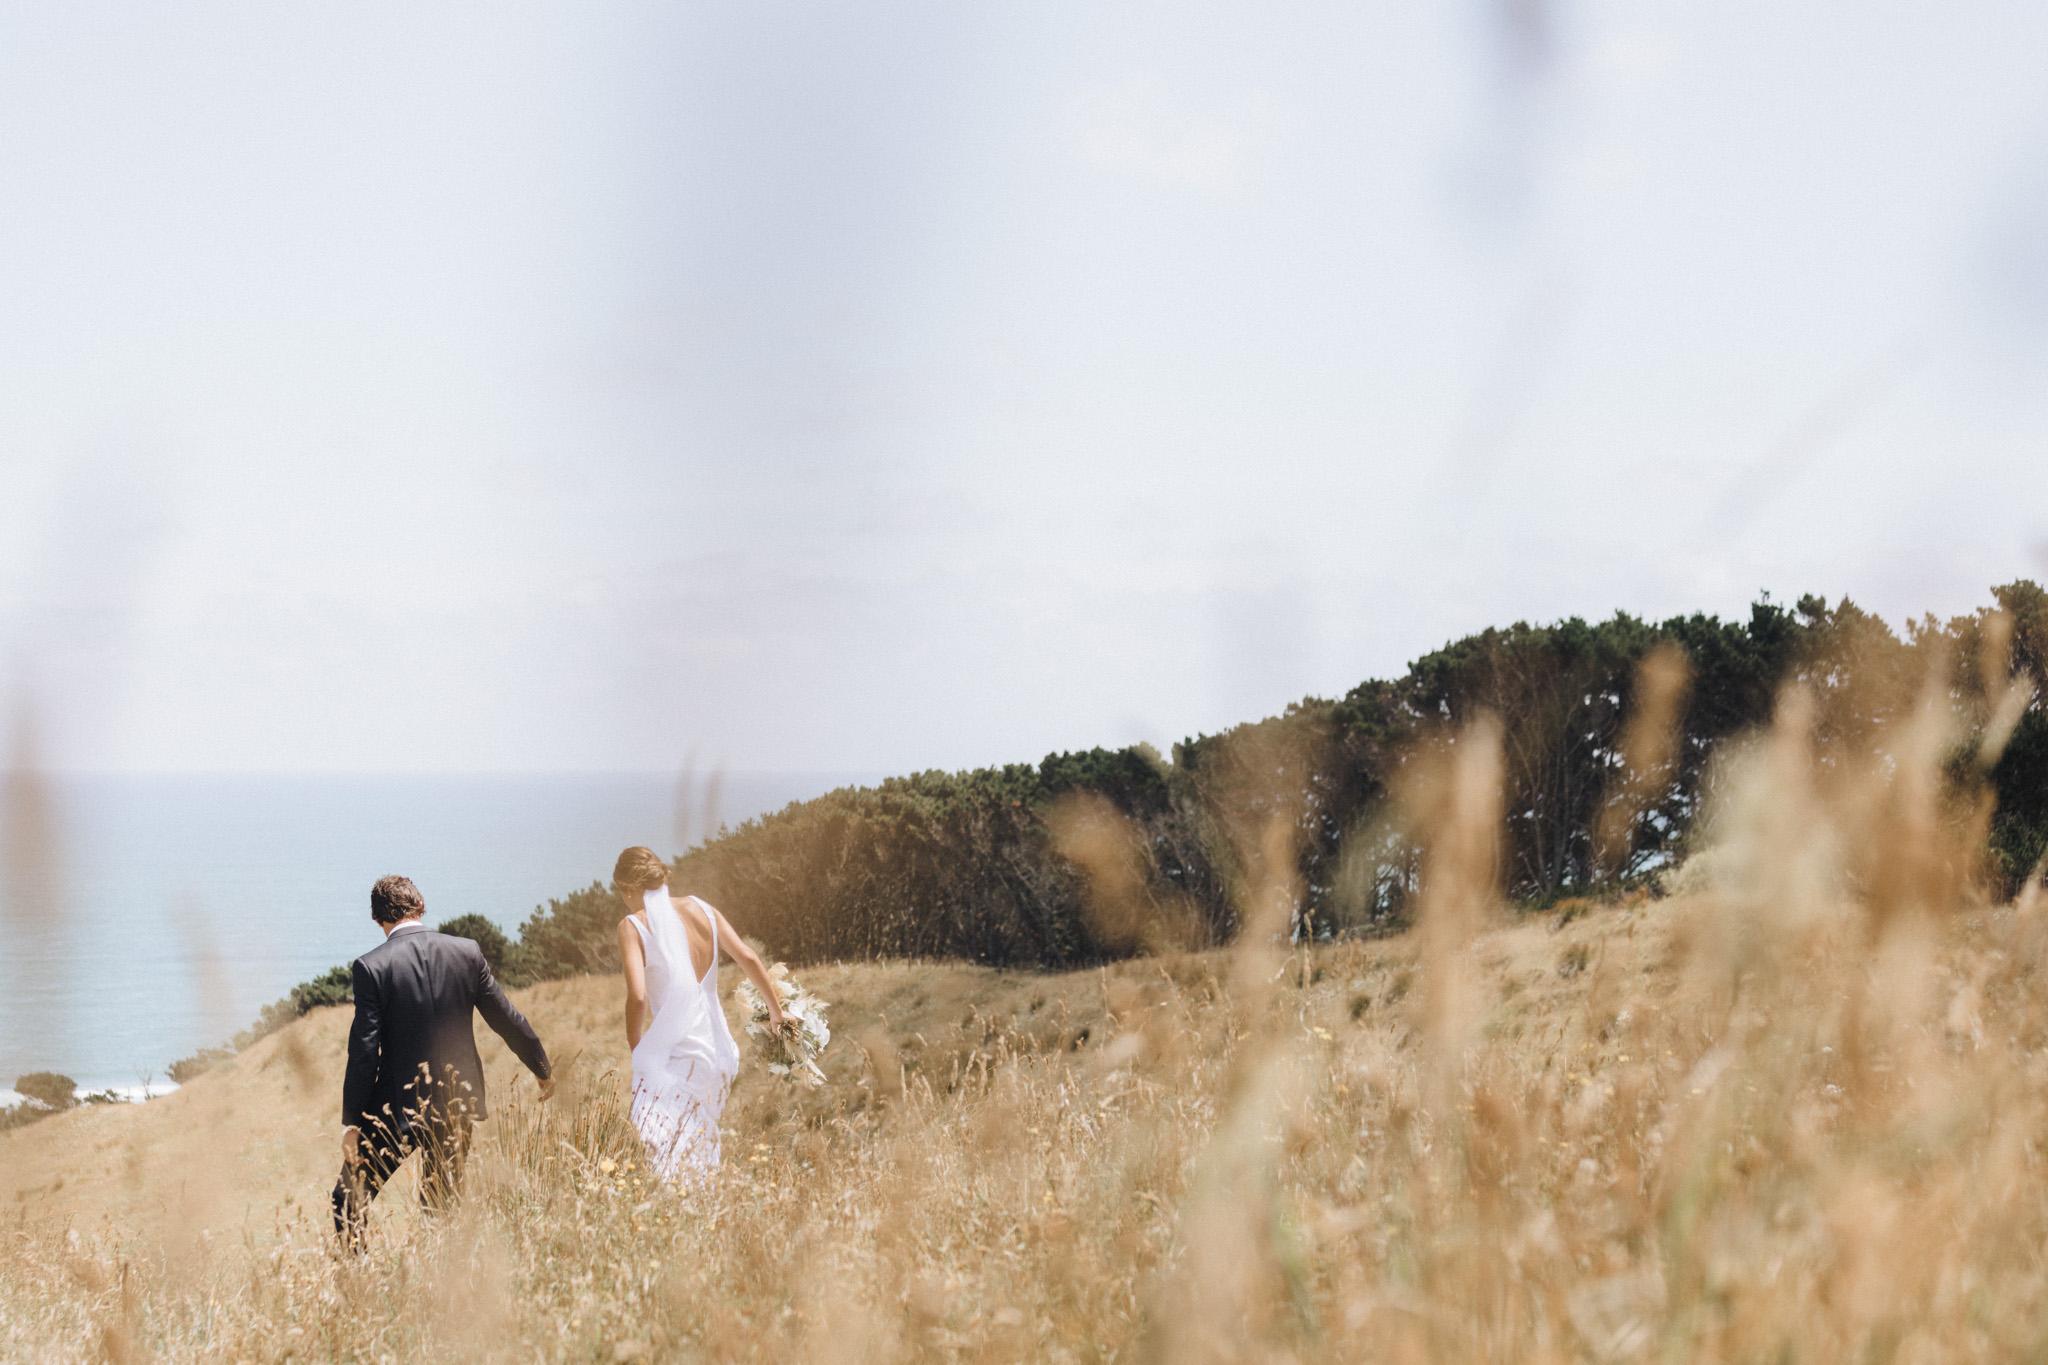 newfound-h-m-castaways-waiuku-auckland-wedding-photographer-44